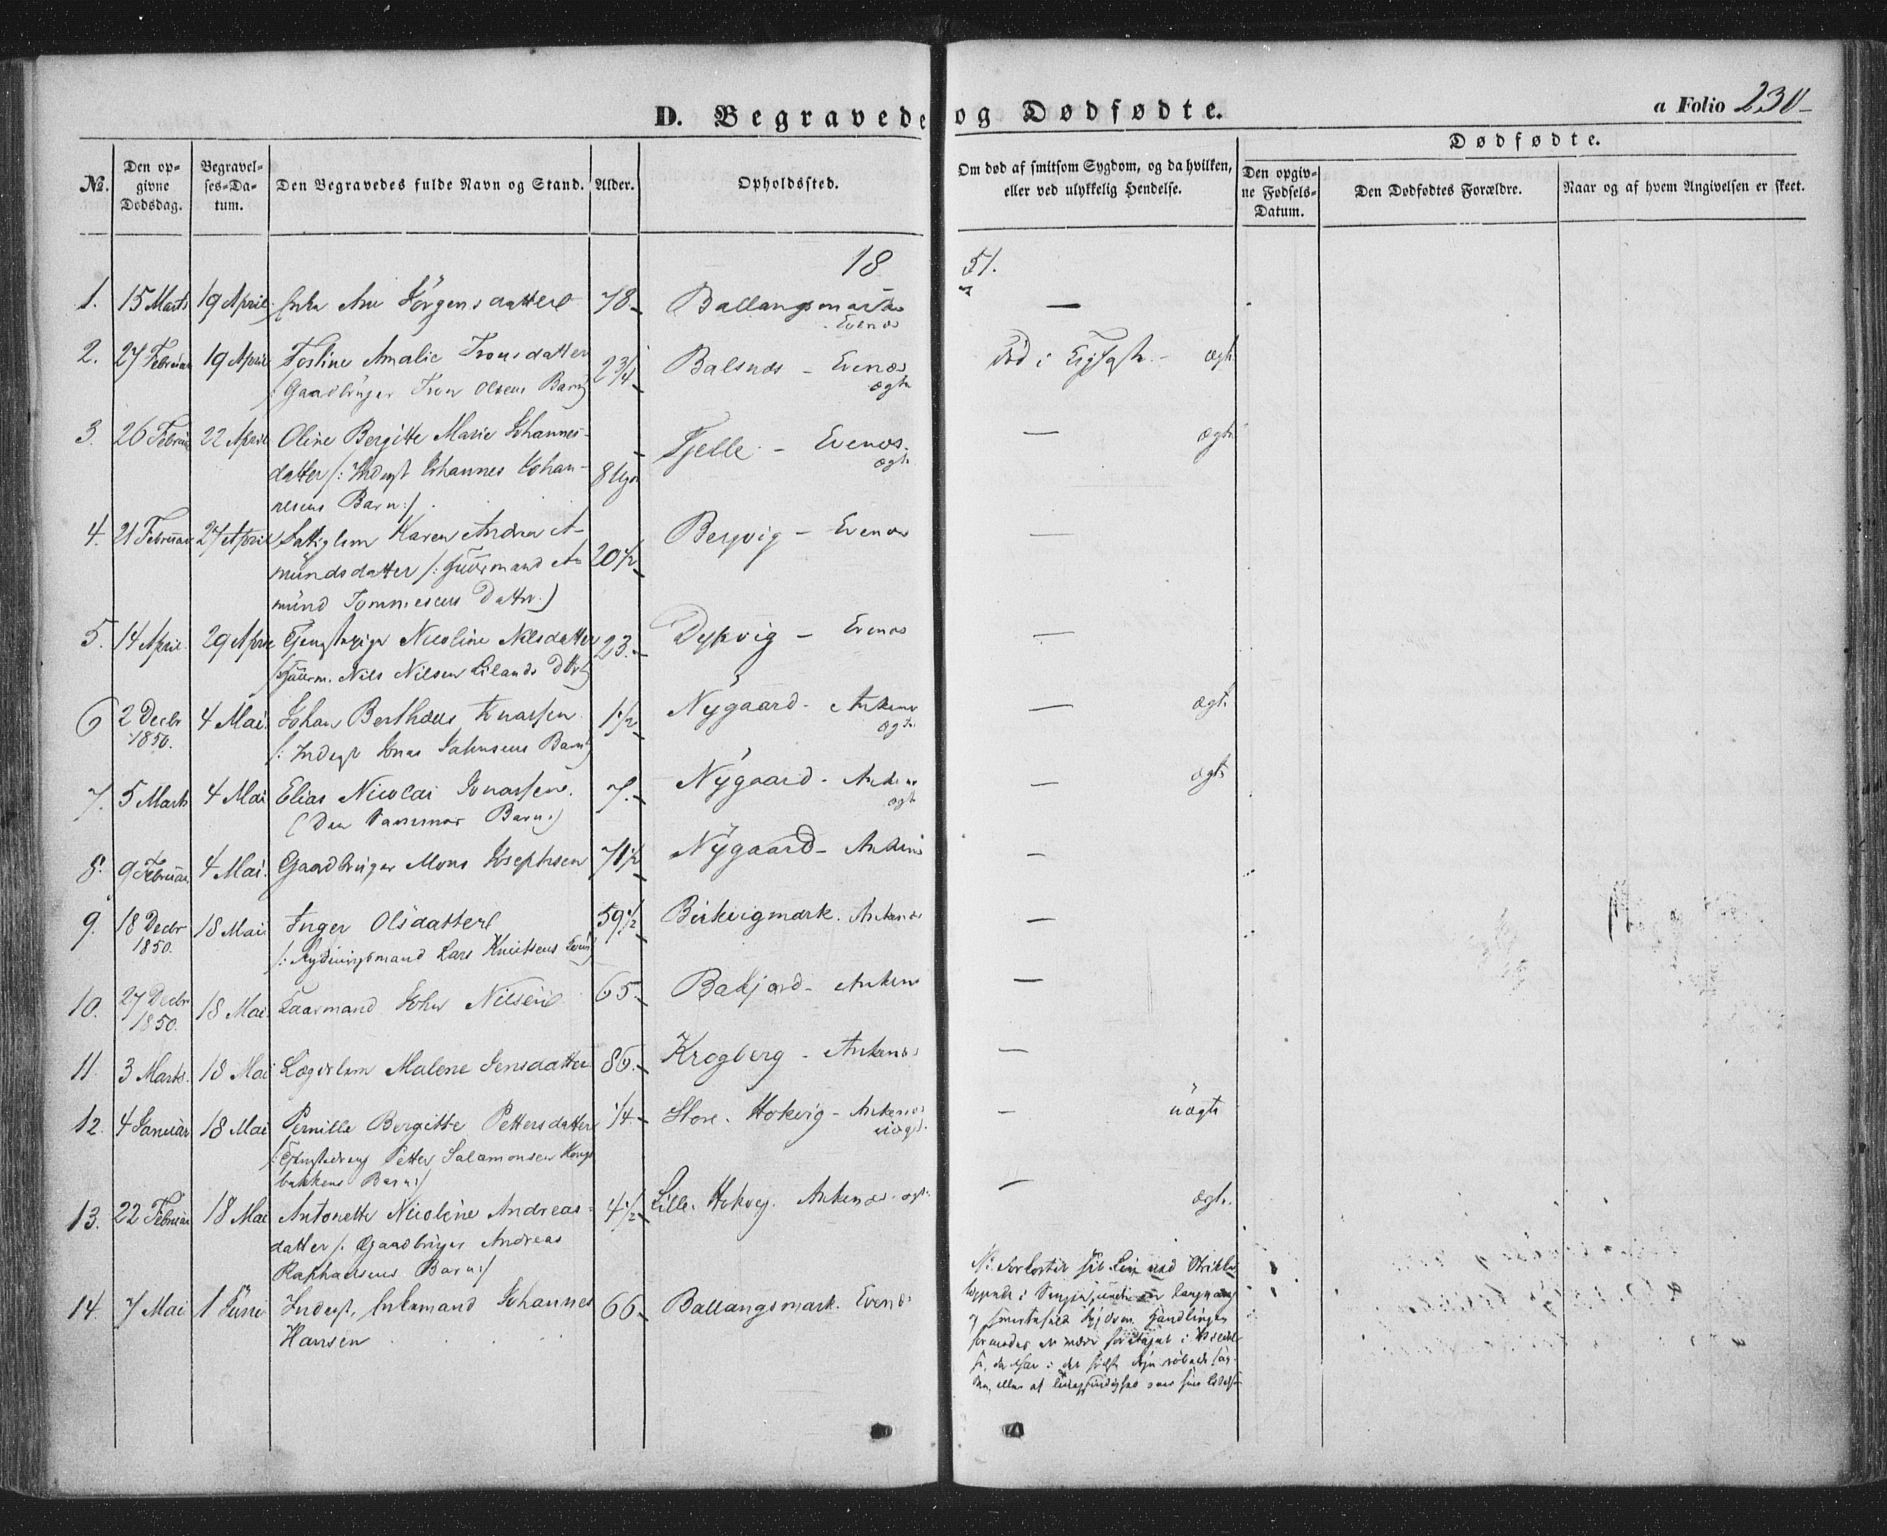 SAT, Ministerialprotokoller, klokkerbøker og fødselsregistre - Nordland, 863/L0895: Ministerialbok nr. 863A07, 1851-1860, s. 230